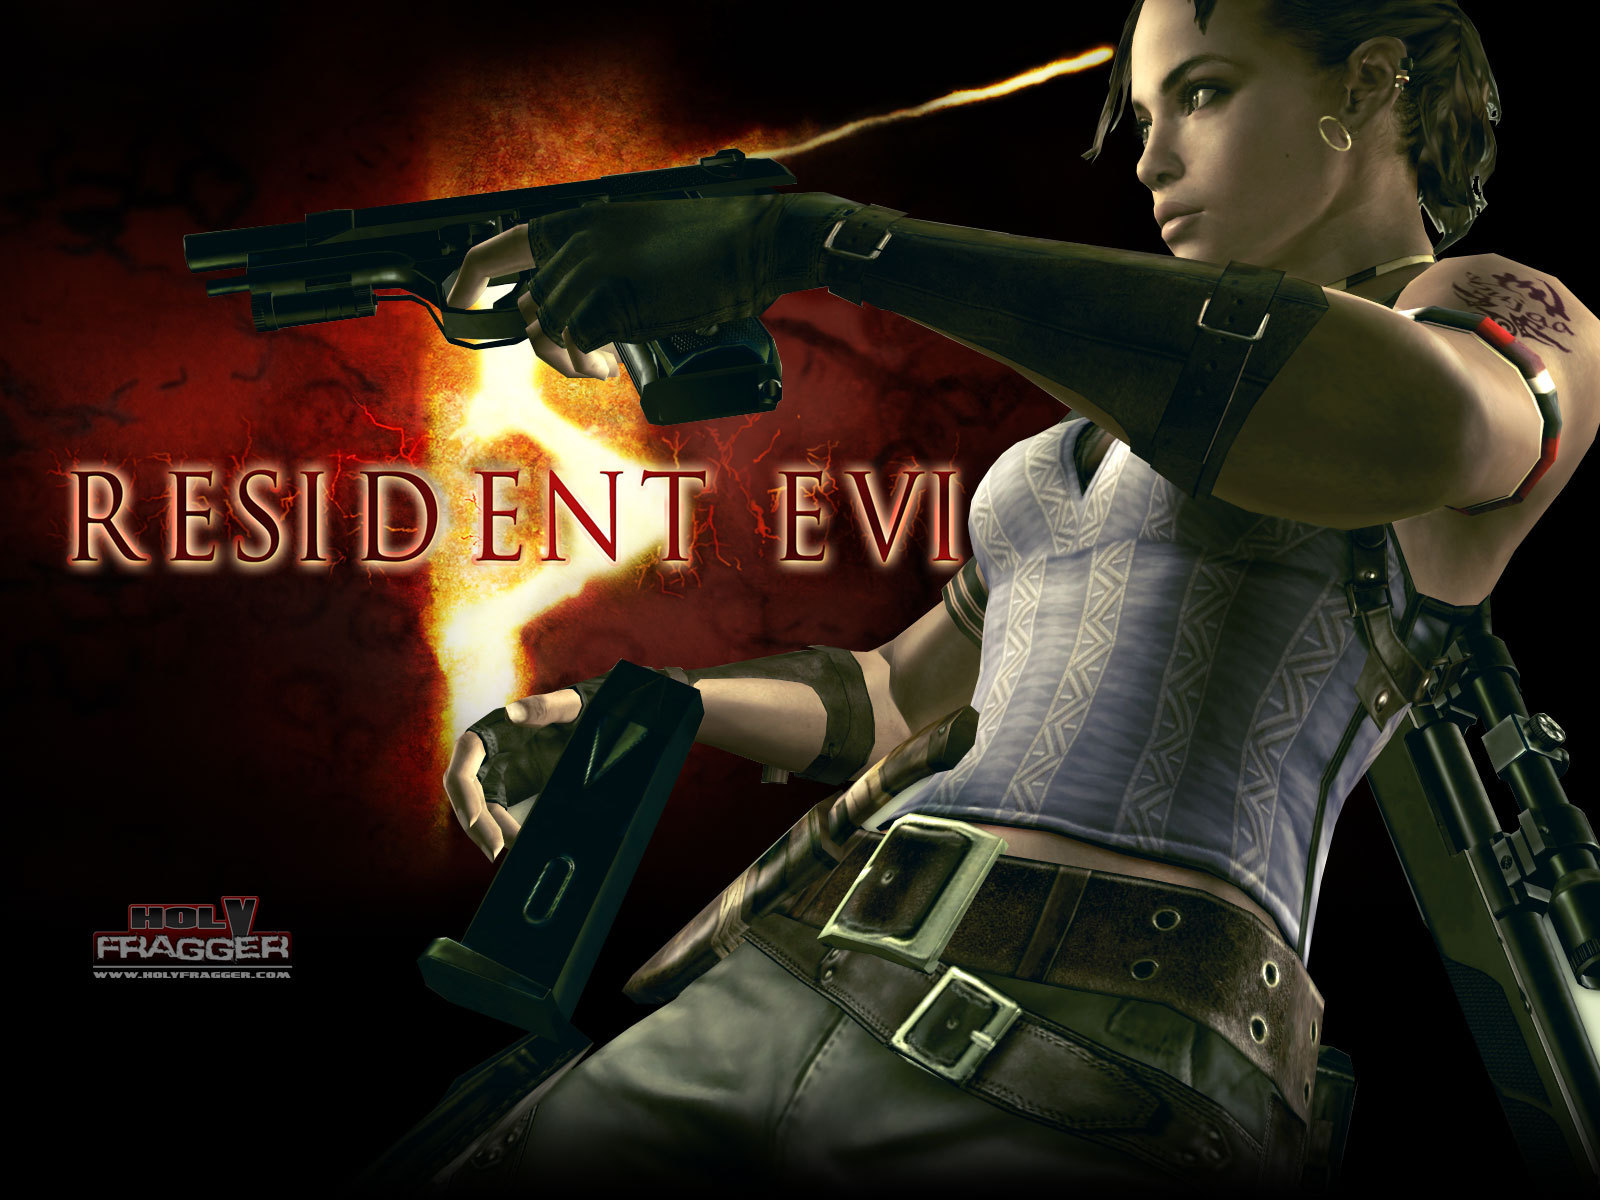 Resident Evil Wallpaper Resident Evil 5 Wallpaper 4931731